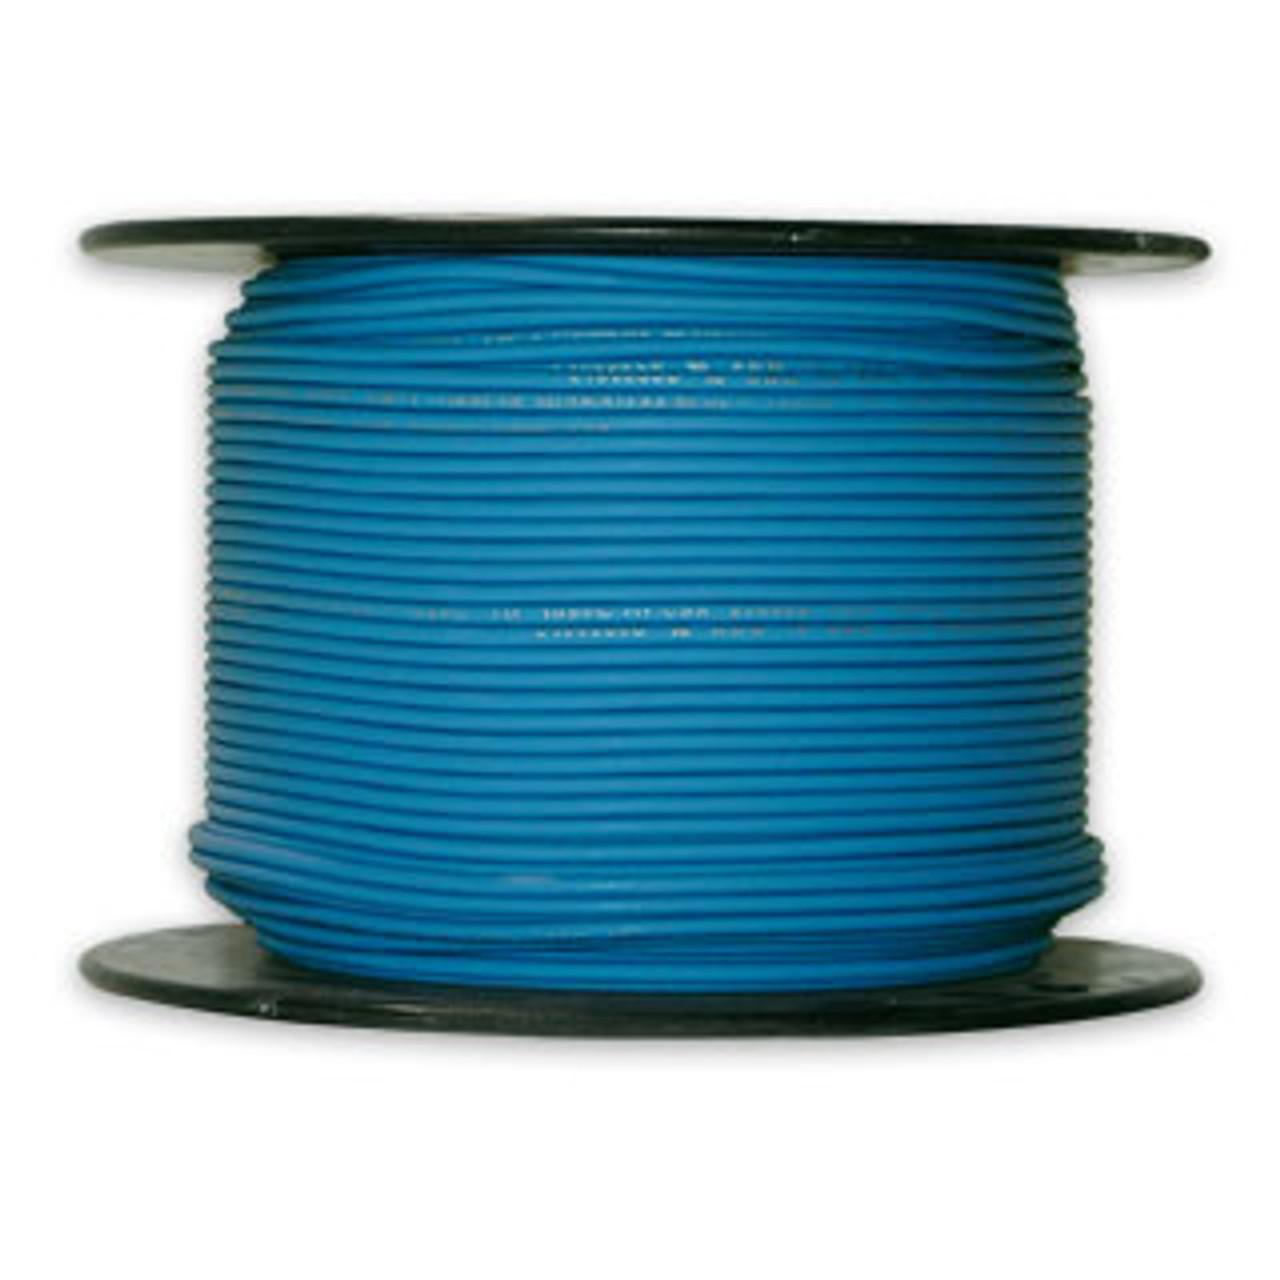 ARCTIC ULTRAFLEX 16GA BLUE  500 FOOT ROLL